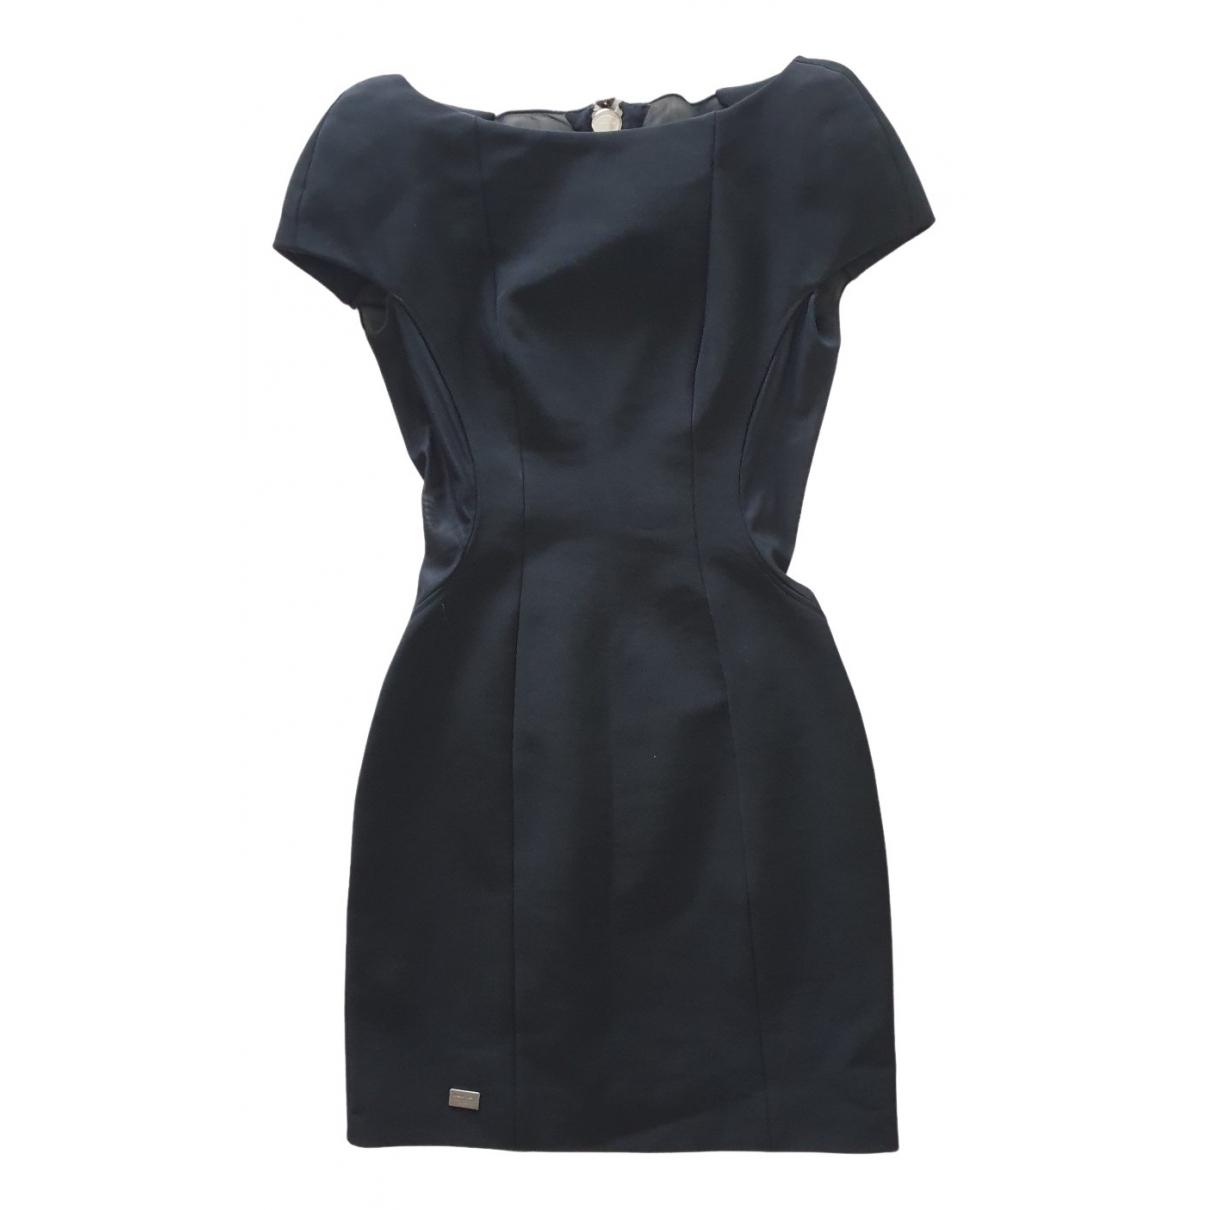 Philipp Plein \N Black dress for Women XS International